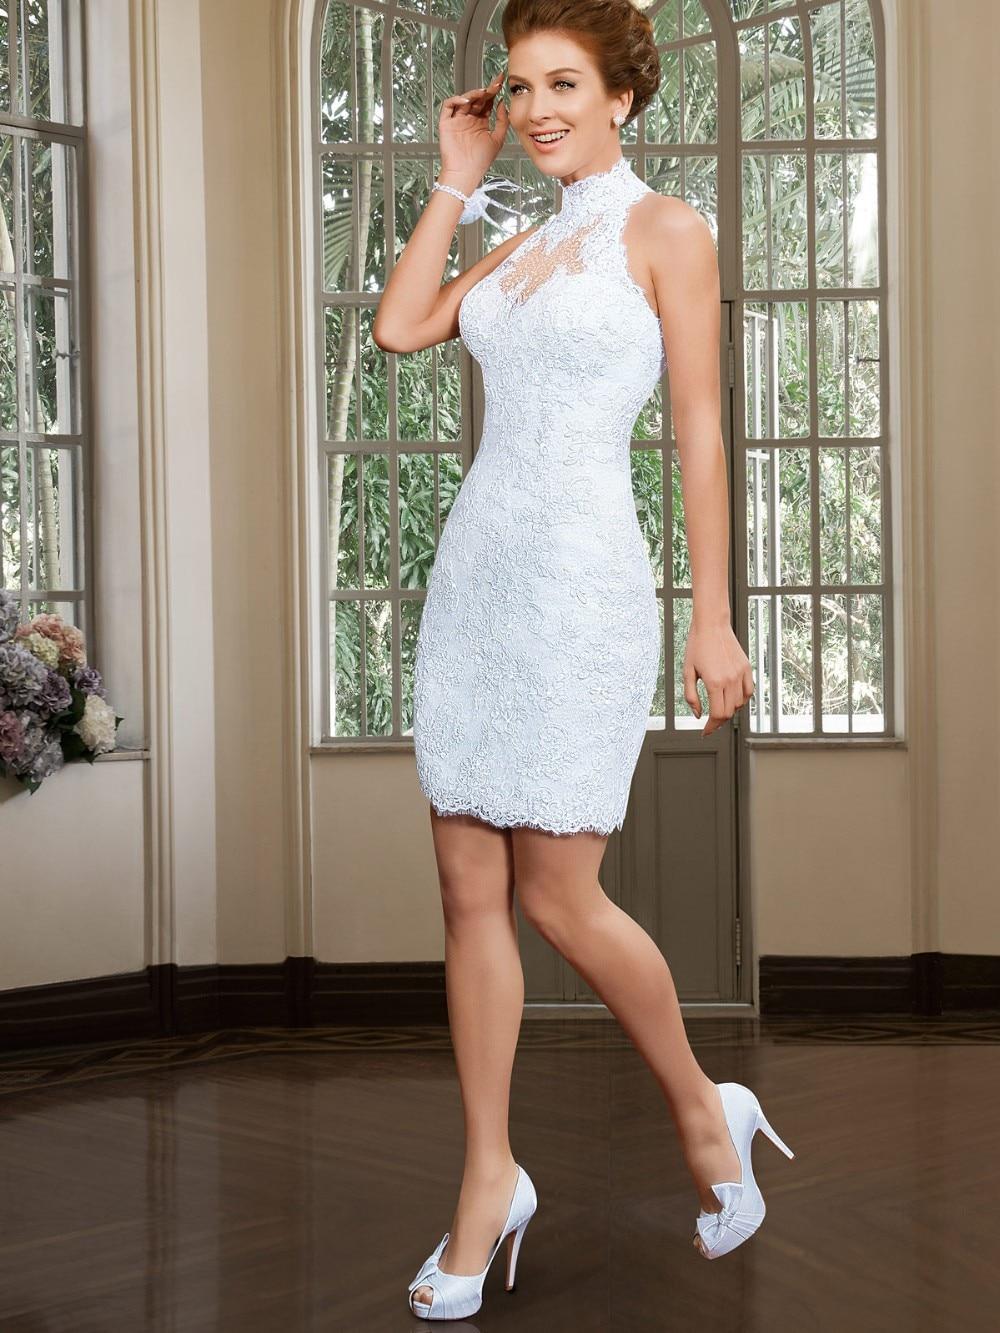 Sexy white shortmini spaghetti strap party cocktail dresses